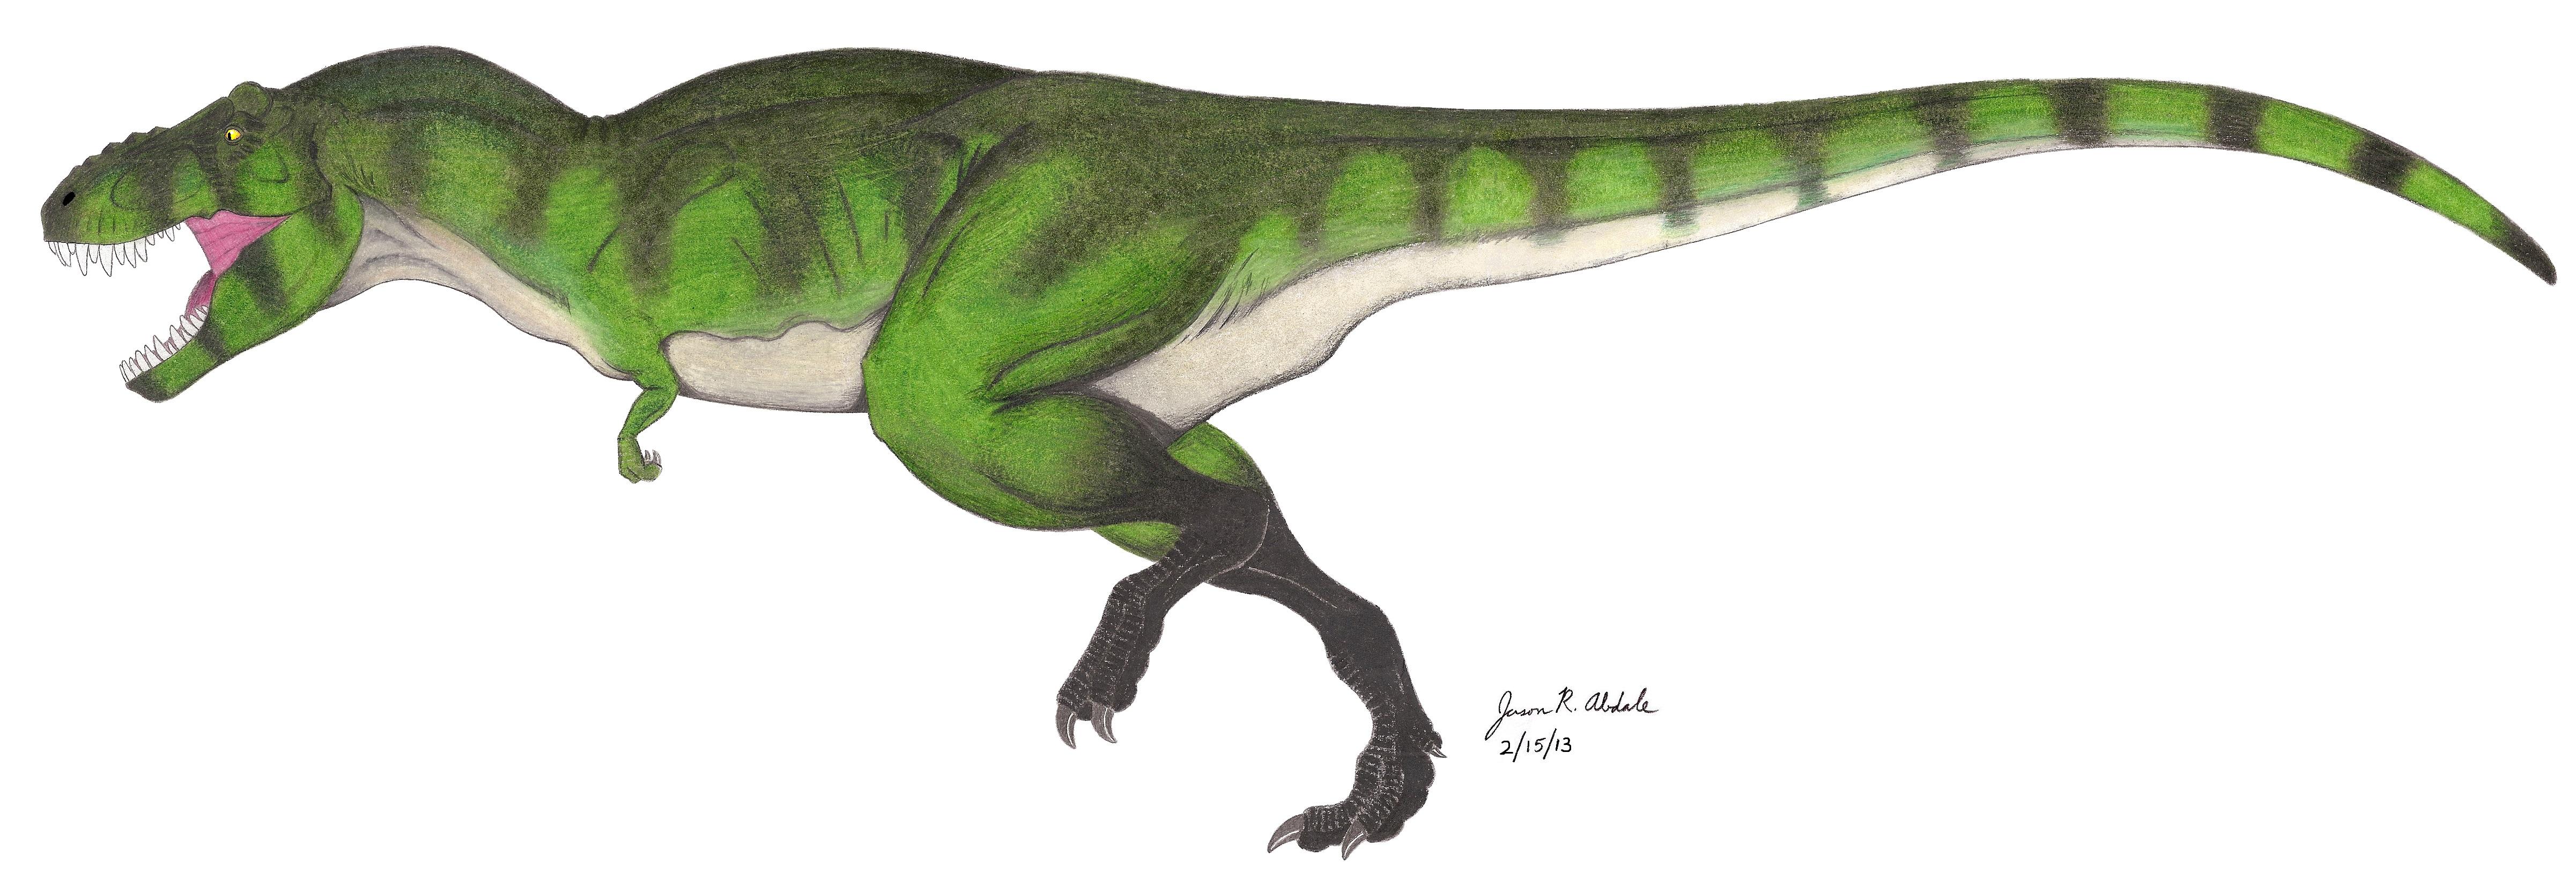 Tyrannosaurus dinosaurs and barbarians for Tyranosaurus